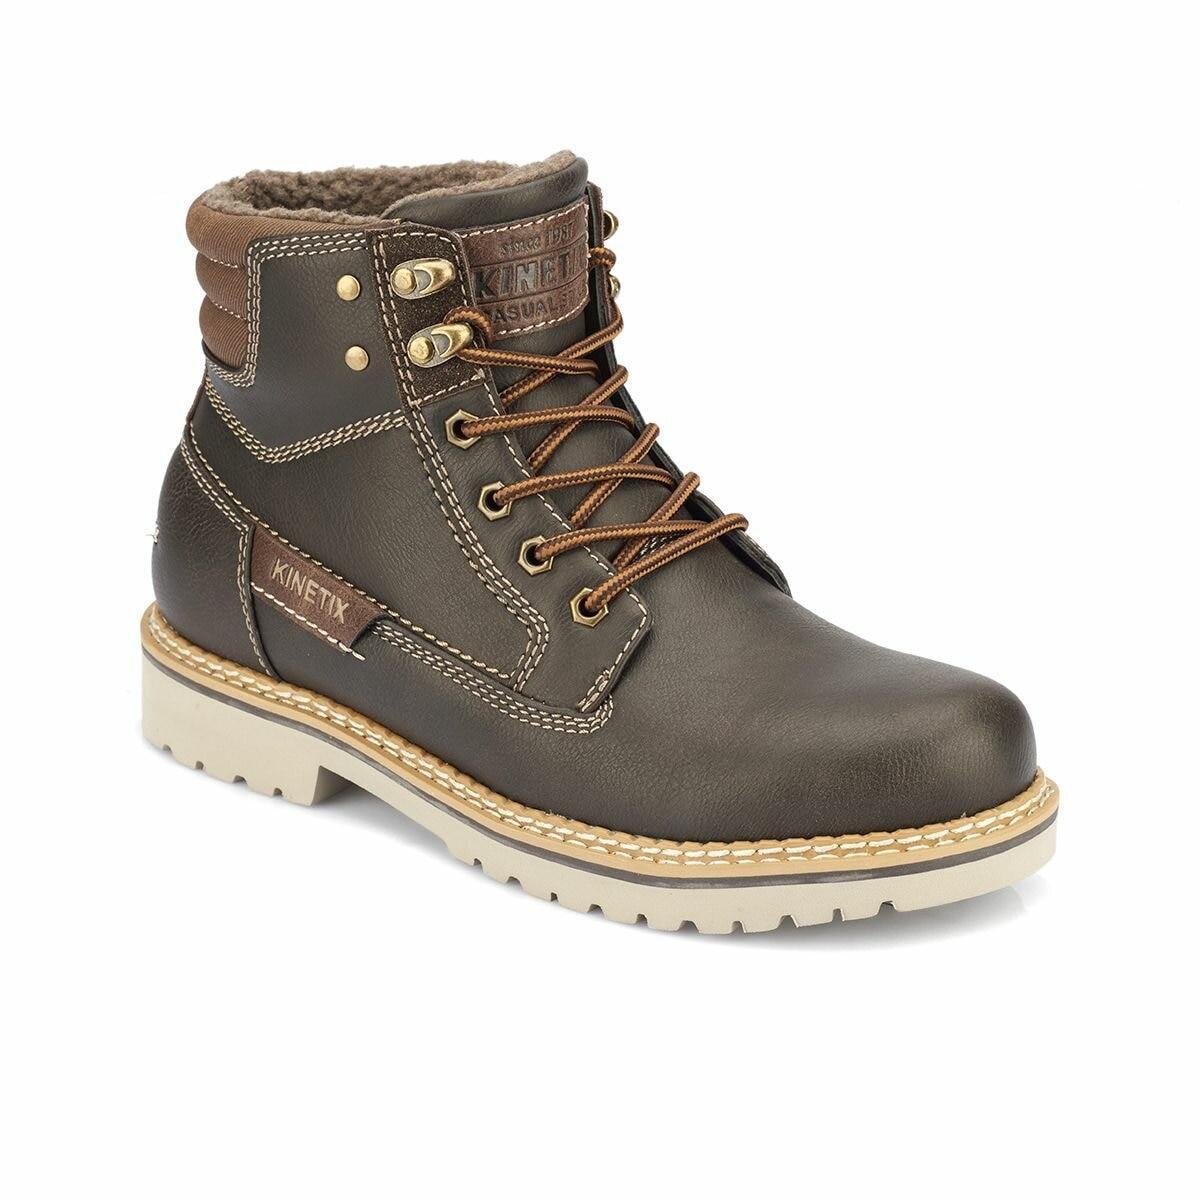 FLO CHARLEY Brown Men Boots KINETIX